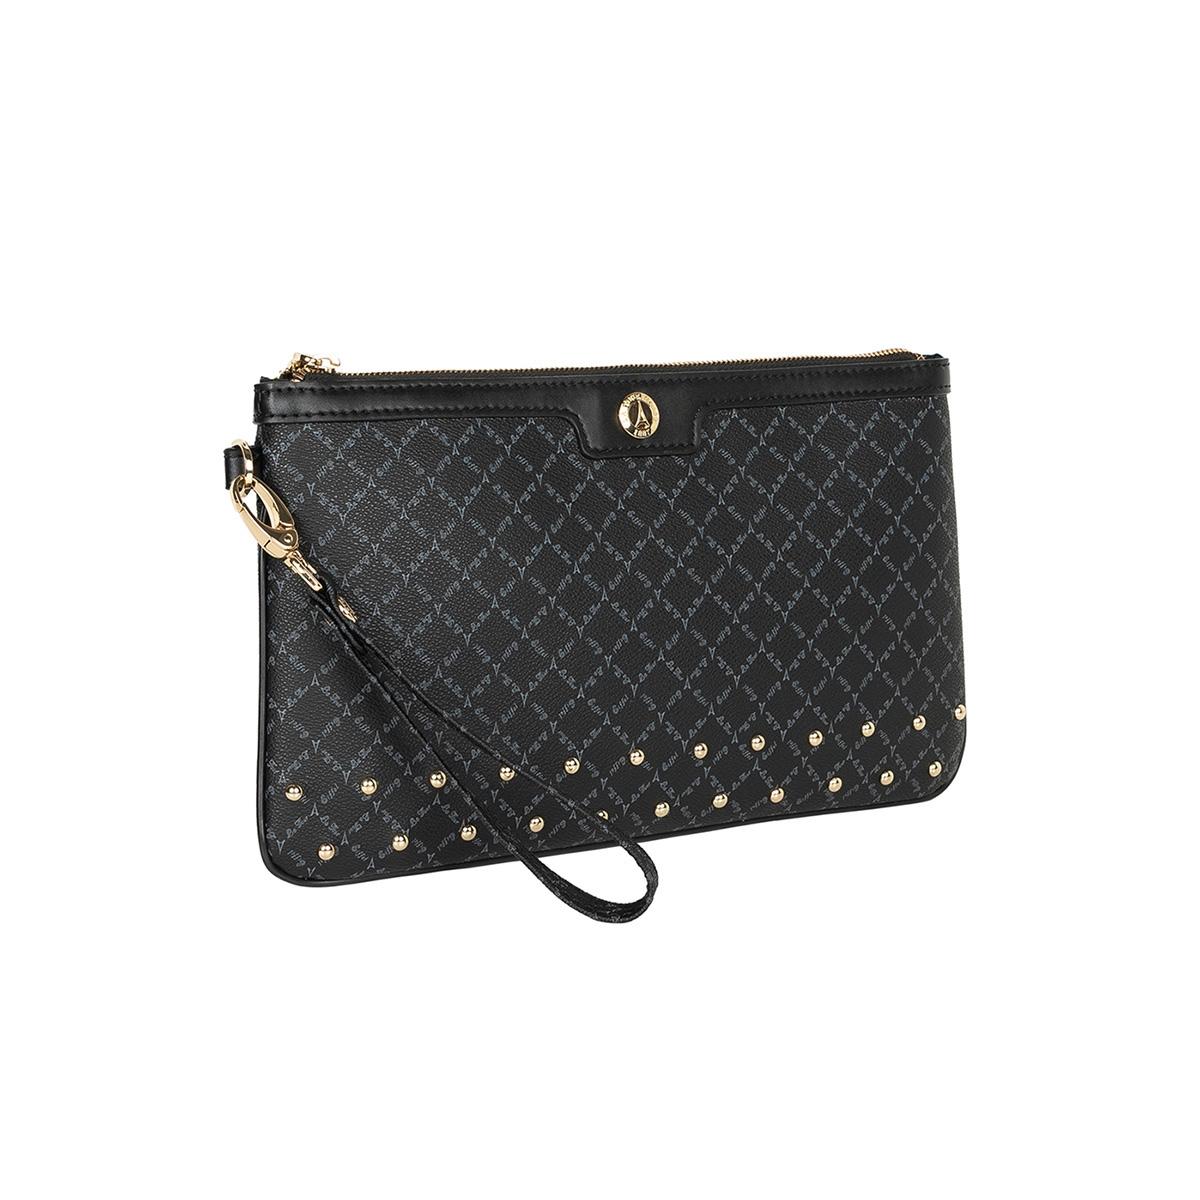 0acf741520 Τσάντα Φάκελος Με Λαβή   Τρούκς La Tour Eiffel Logo-Δέρμα 151006 Μαύρος